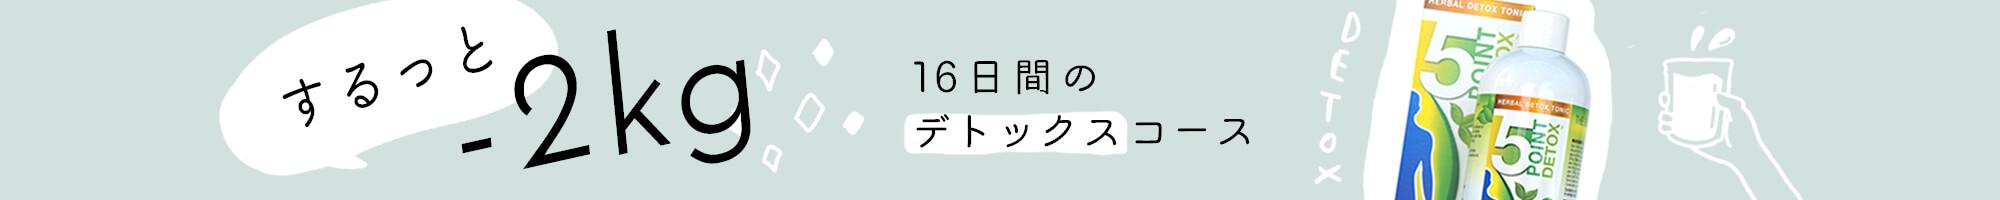 181117_5pointdetox